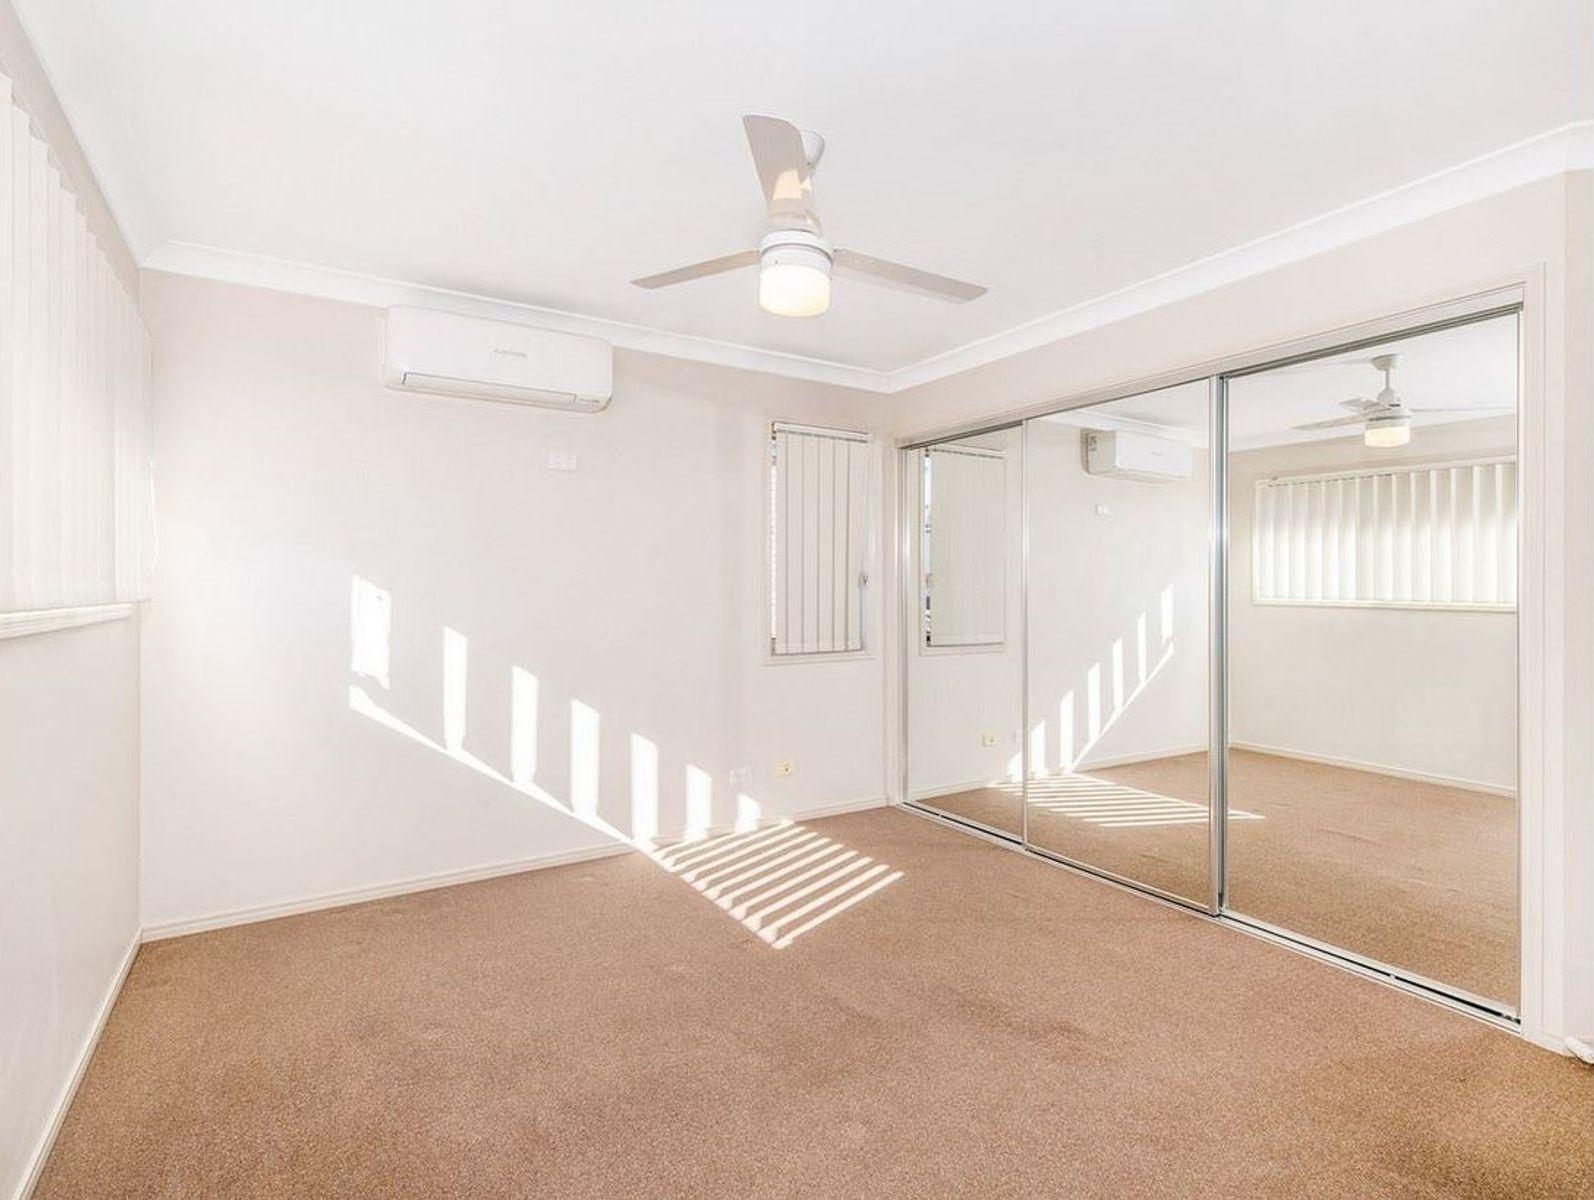 38/100 Oakmont Avenue, Oxley, QLD 4075